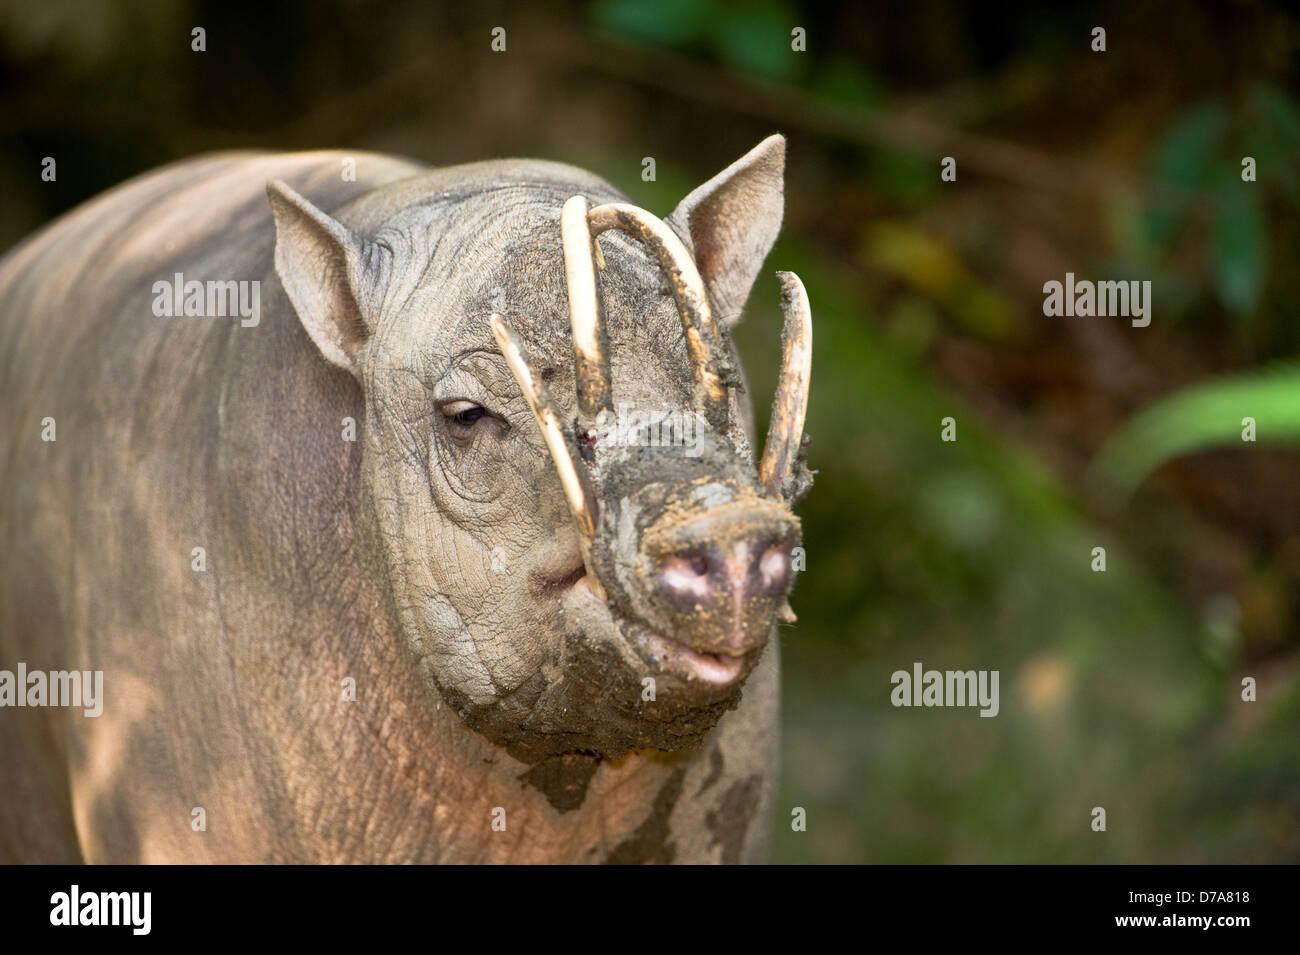 Close-up male Babirusa Babyrousa celebensis Singapore Zoo Singapore - Stock Image